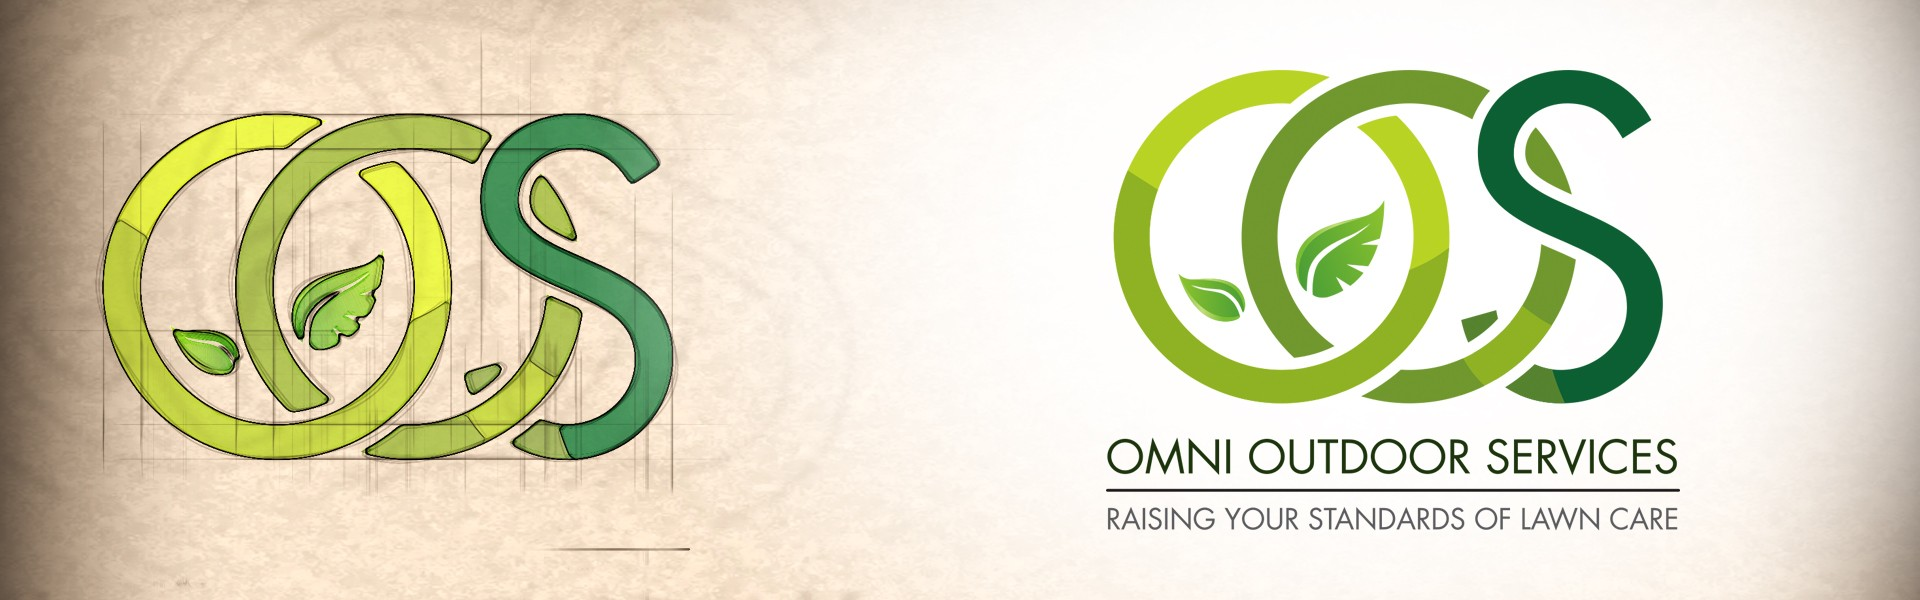 OMNI Outdoor Services